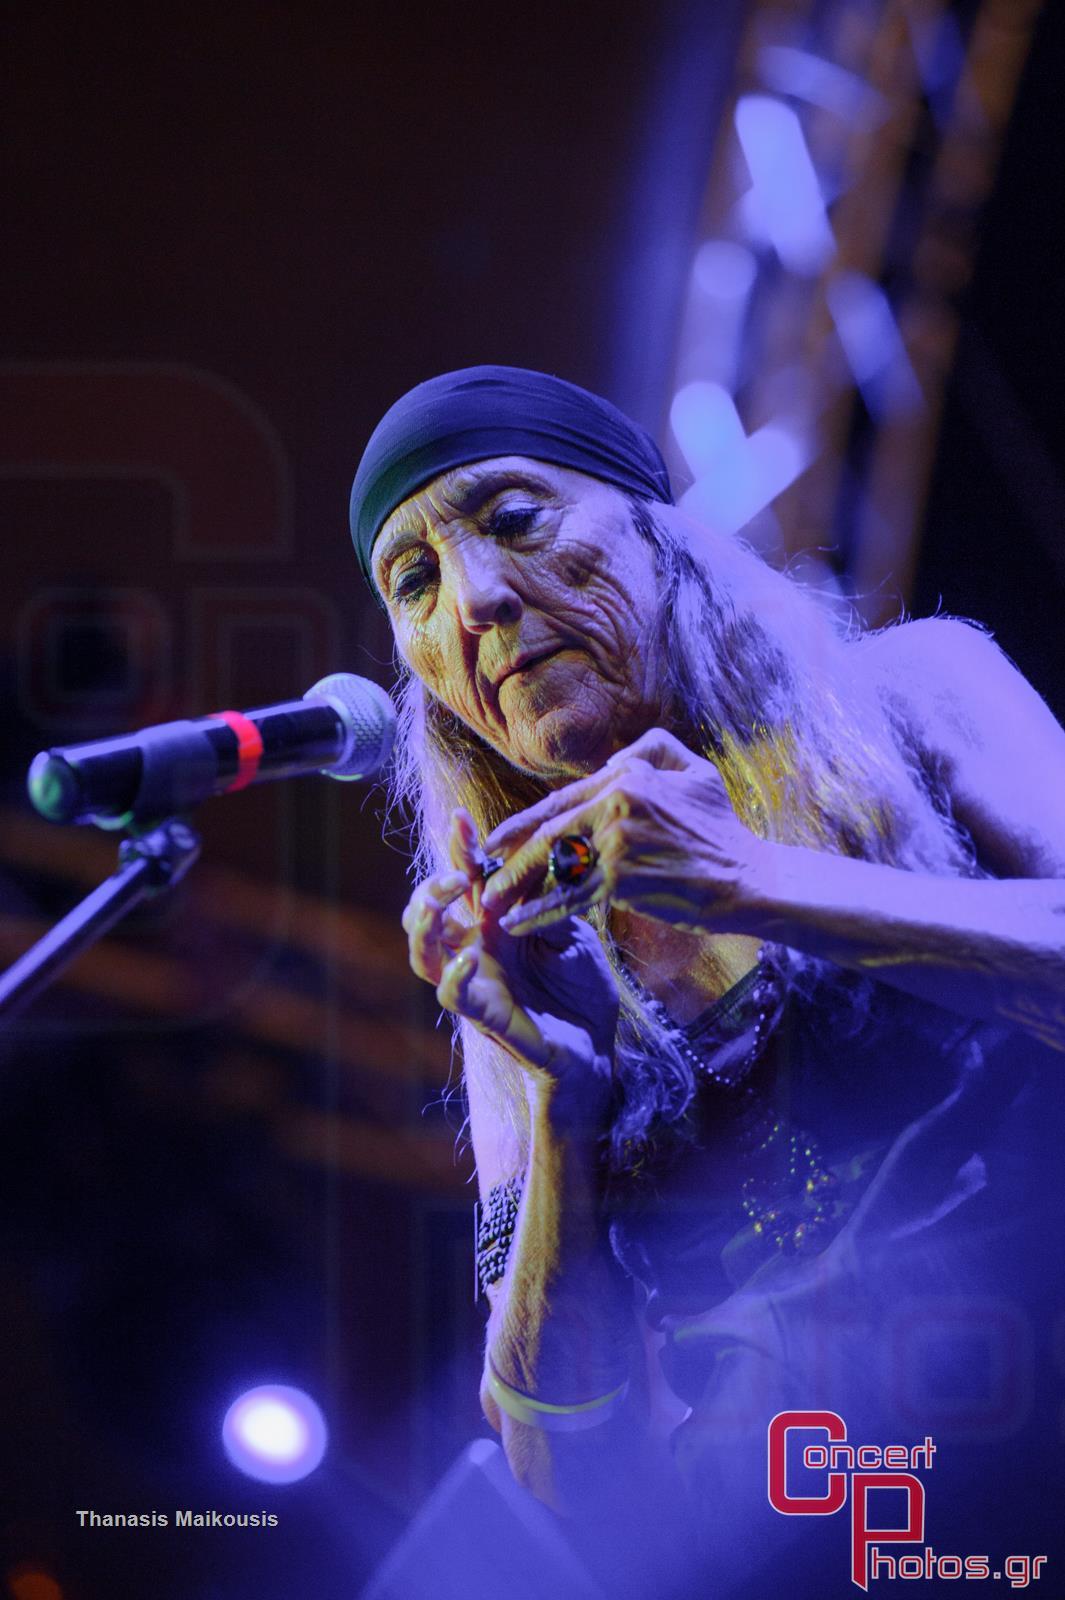 Active Member - Τραγούδα μας να φύγει το σκοτάδι- photographer: Thanasis Maikousis - concertphotos_-5925